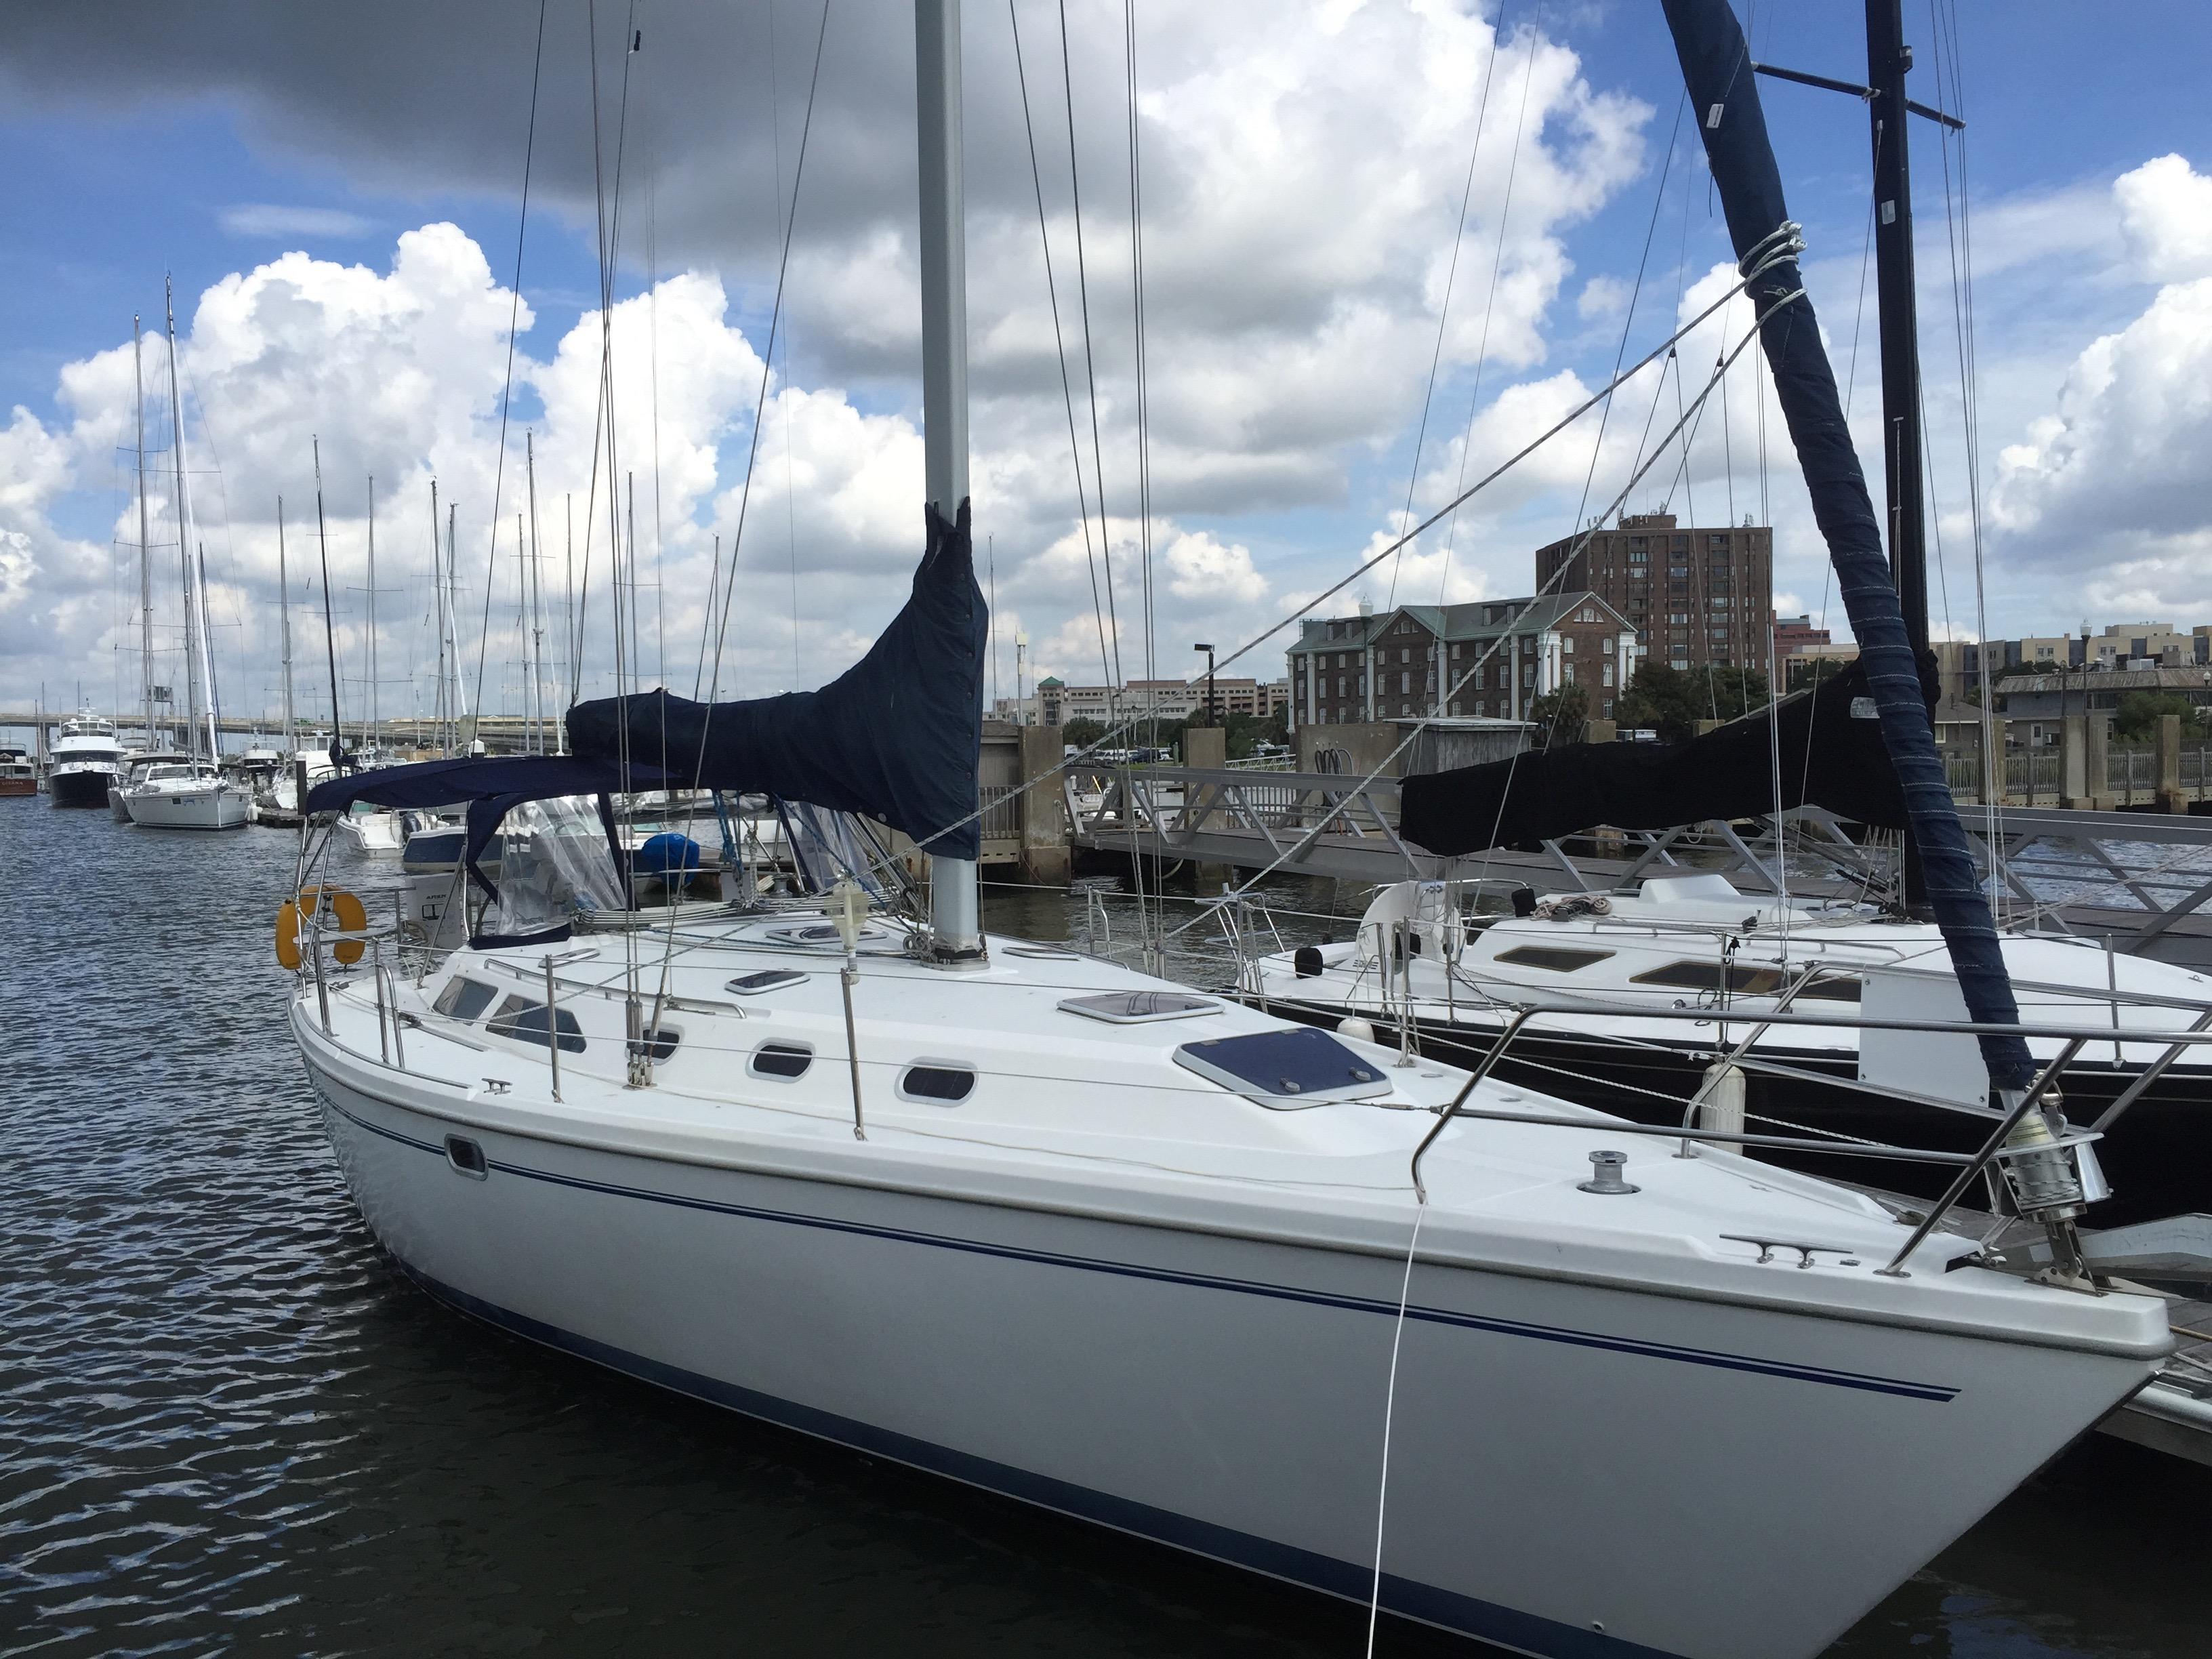 2000 Catalina 42 MkII Sail Boat For Sale Wwwyachtworldcom